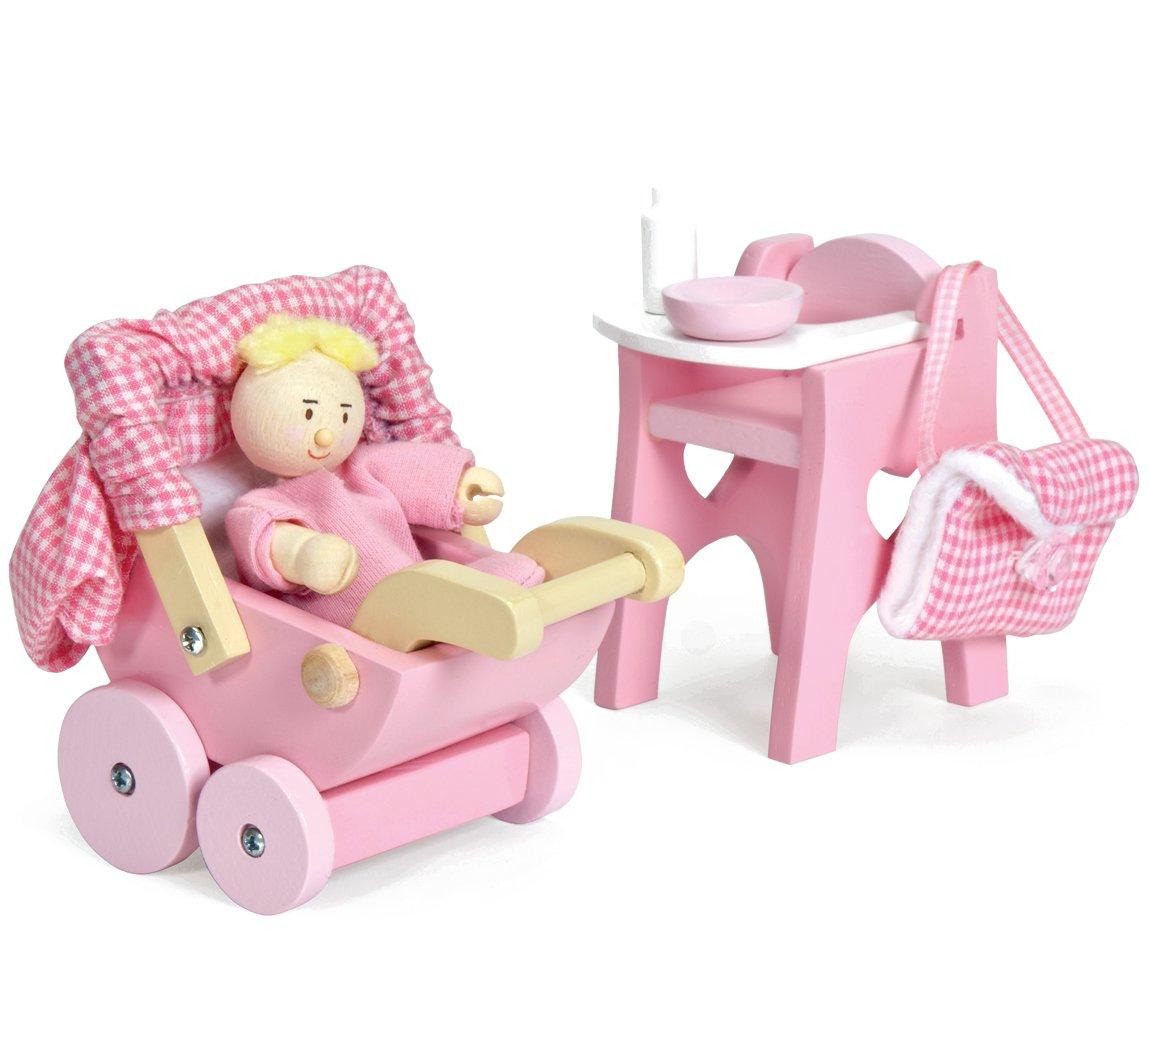 Le Toy Van - Kinderset mit Babypuppe (LME044)